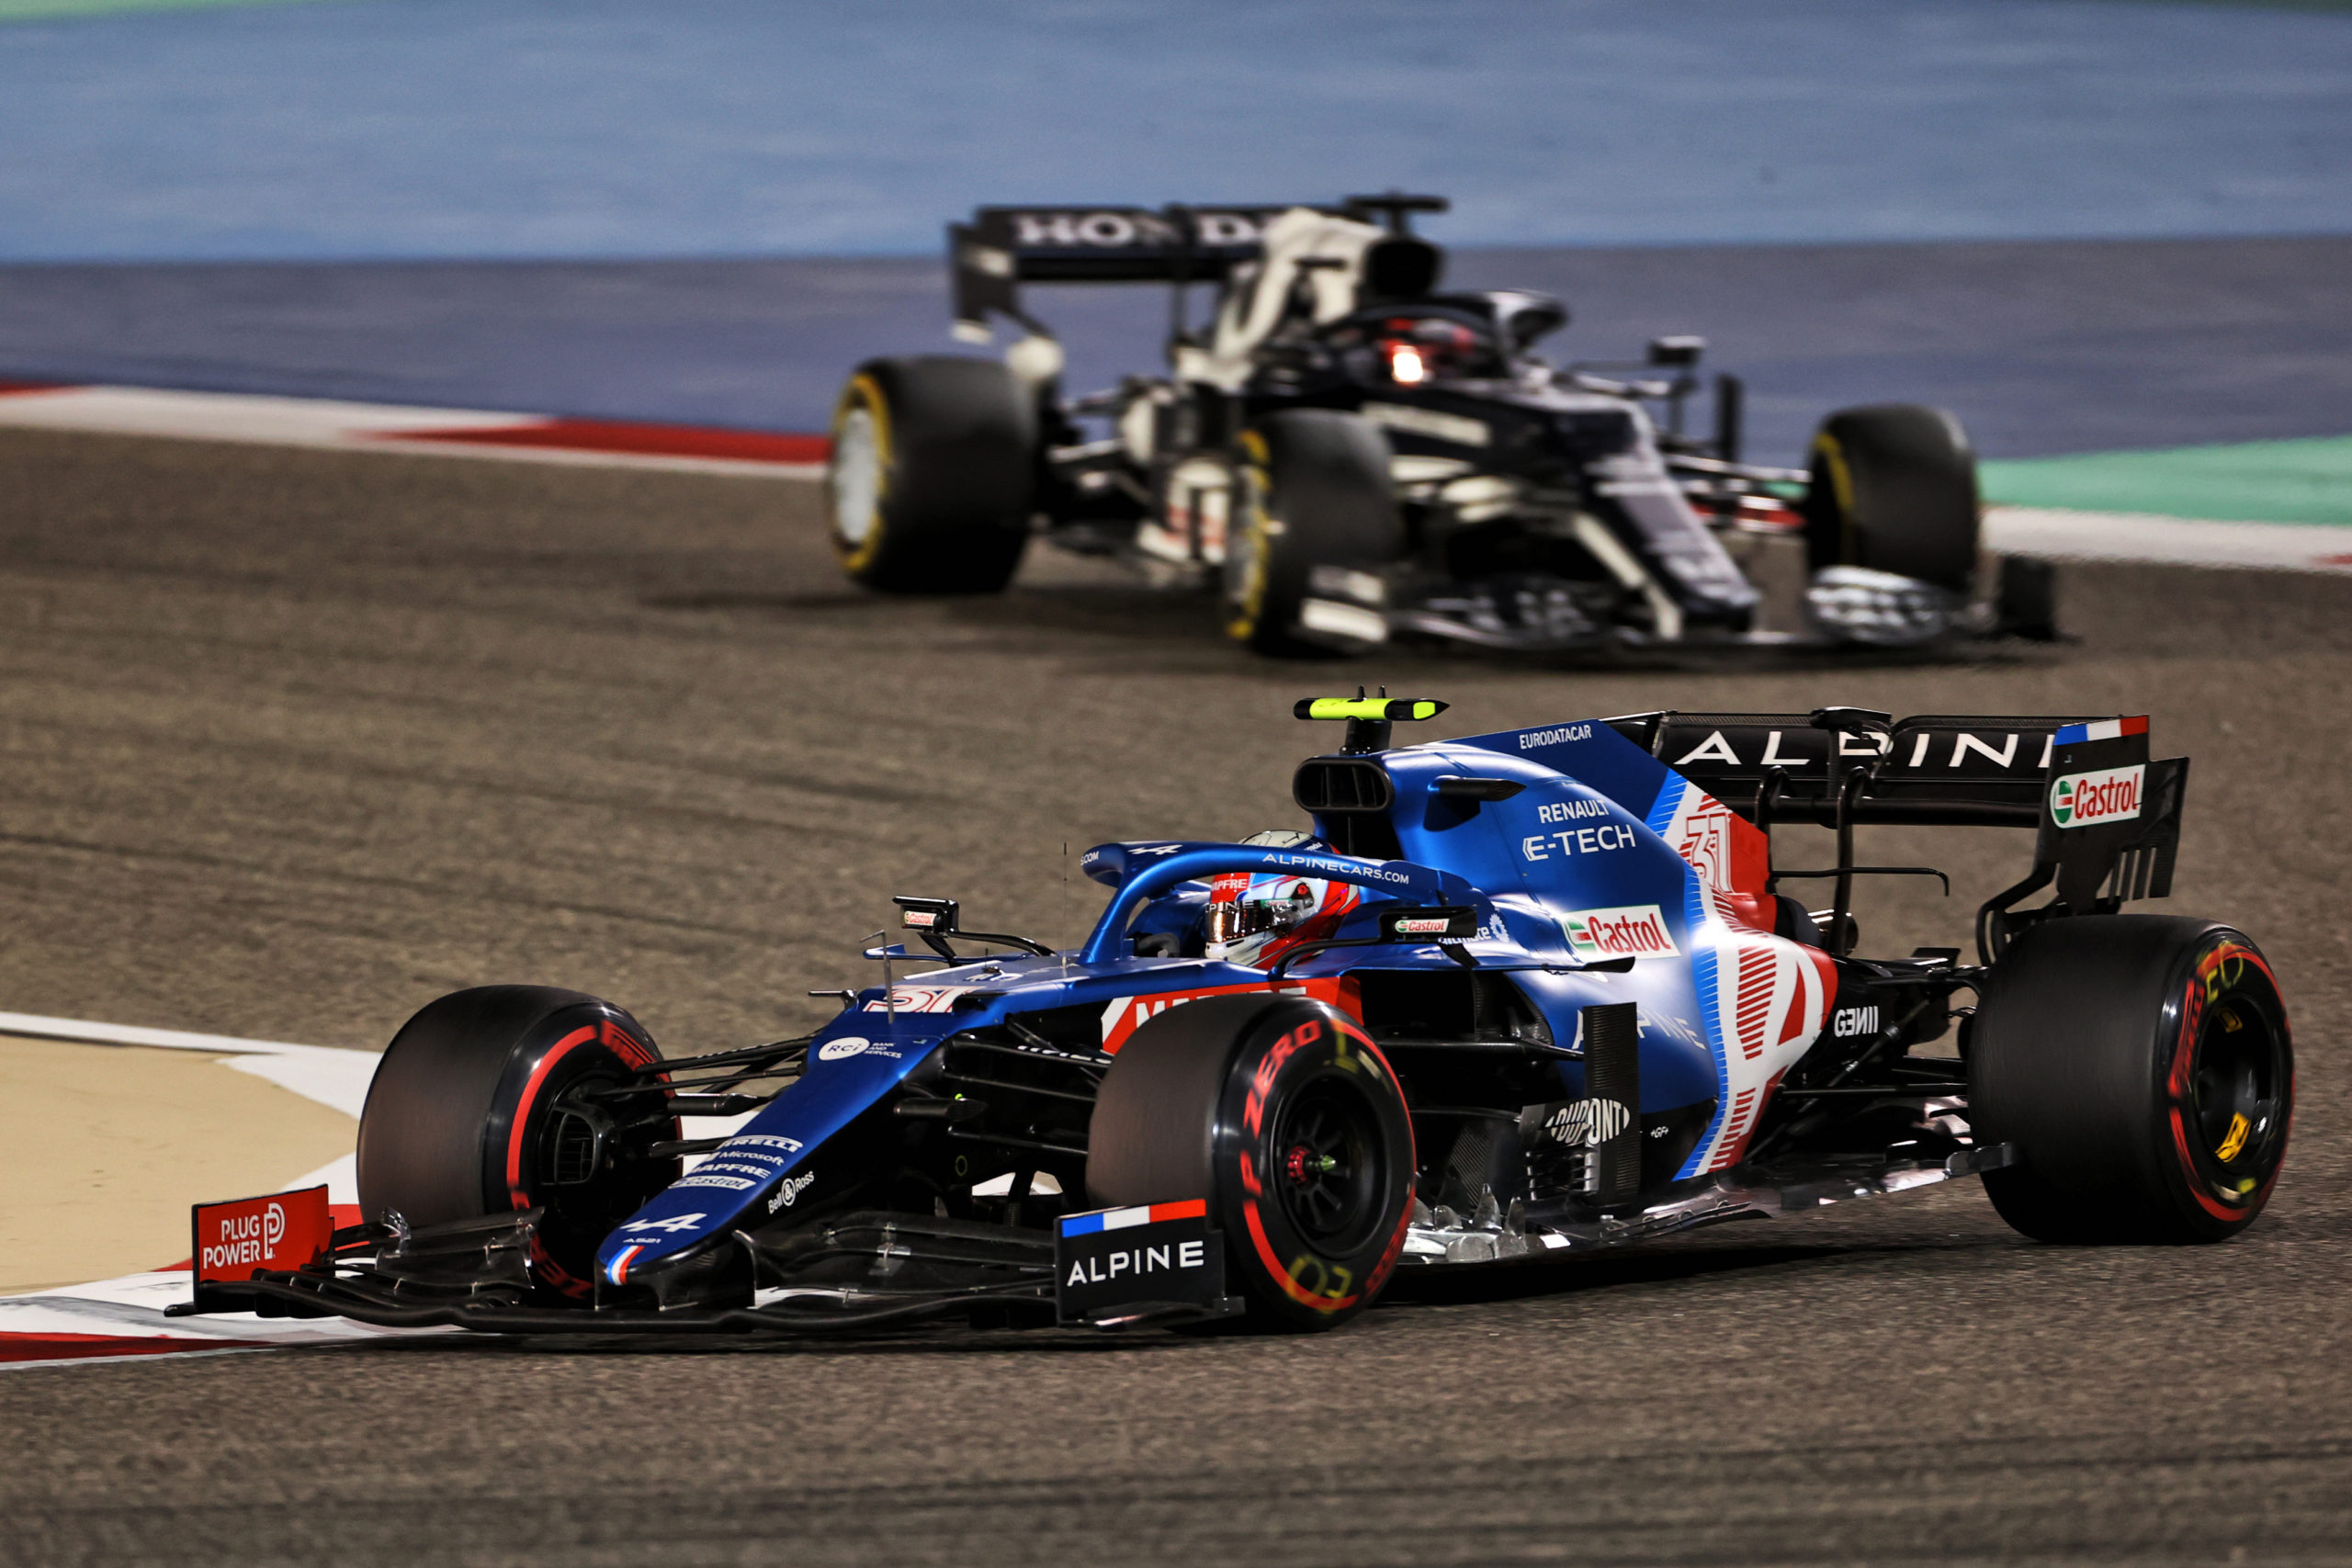 Esteban Ocon (FRA) Alpine F1 Team A521. Bahrain Grand Prix, Sunday 28th March 2021. Sakhir, Bahrain.